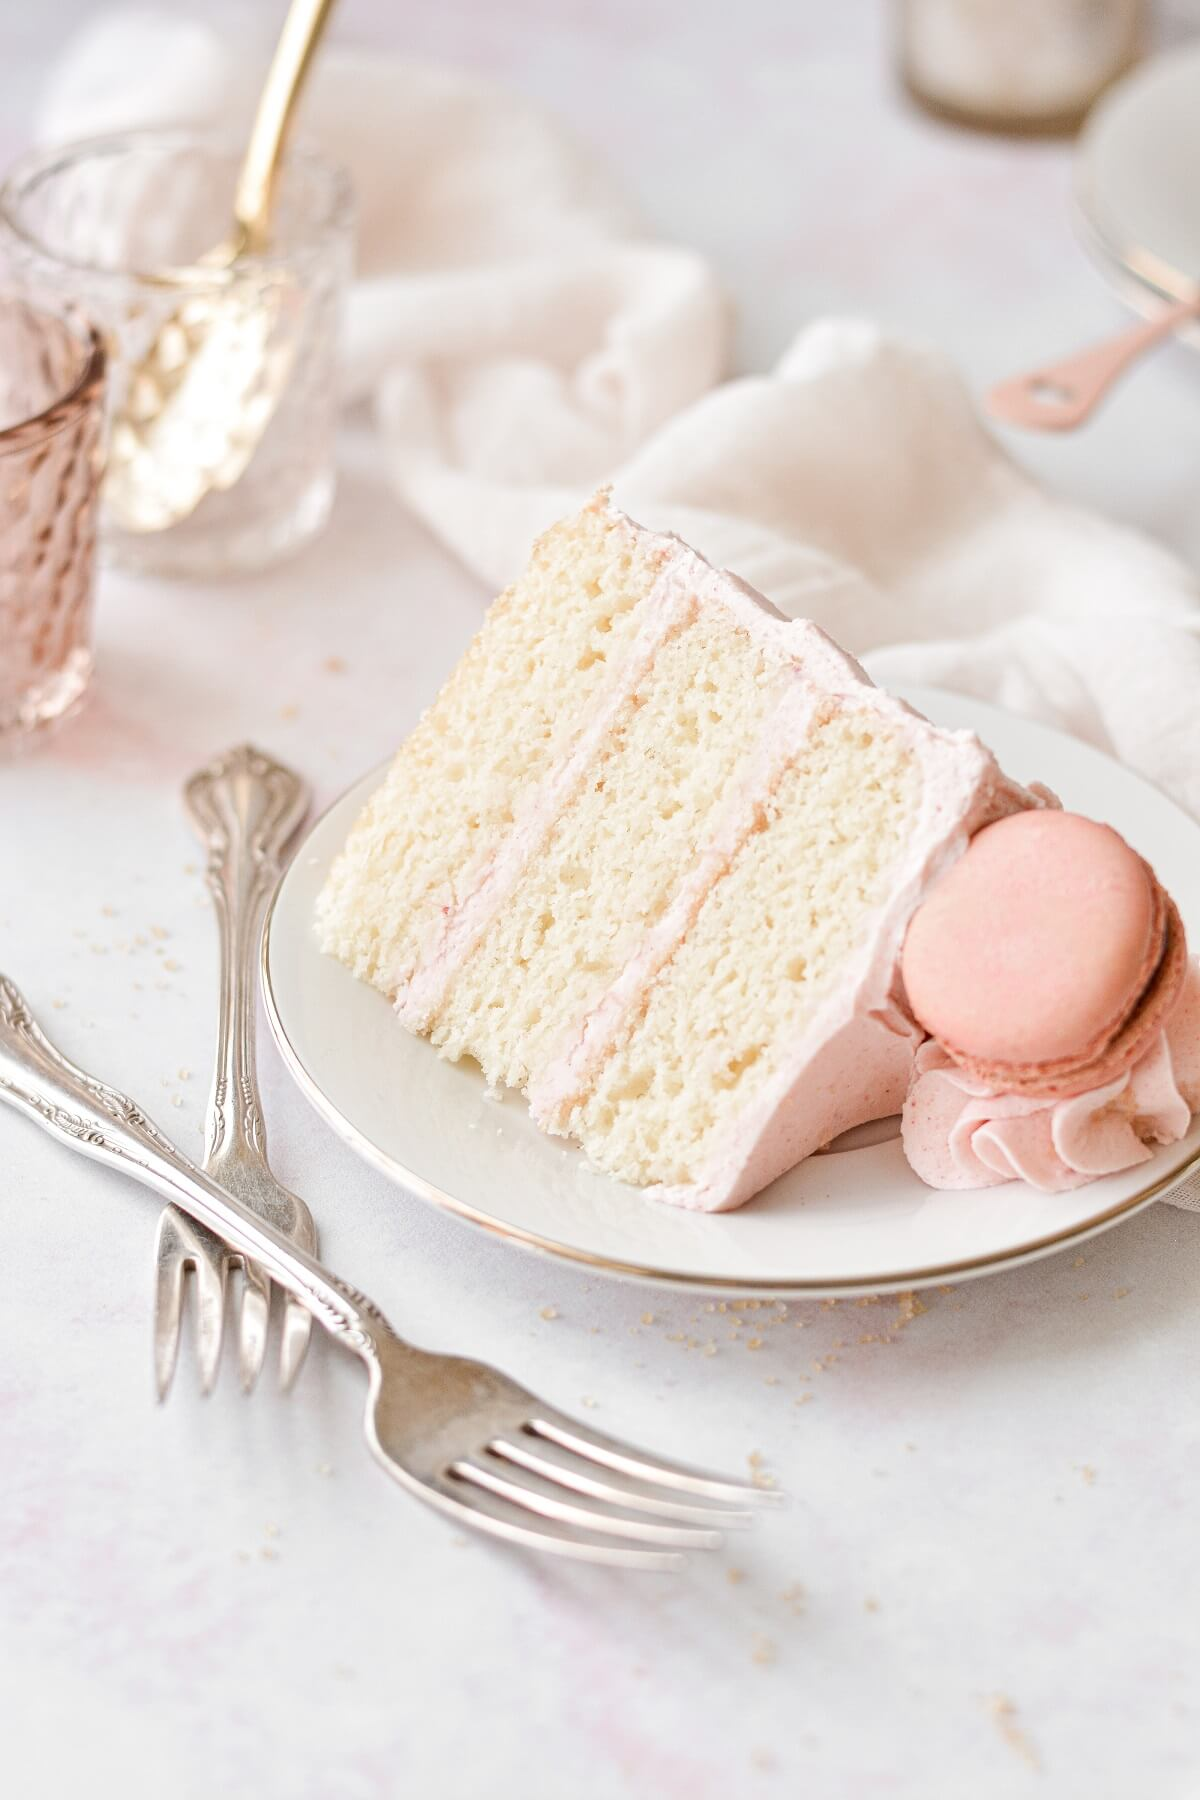 A slice of strawberry almond cake.